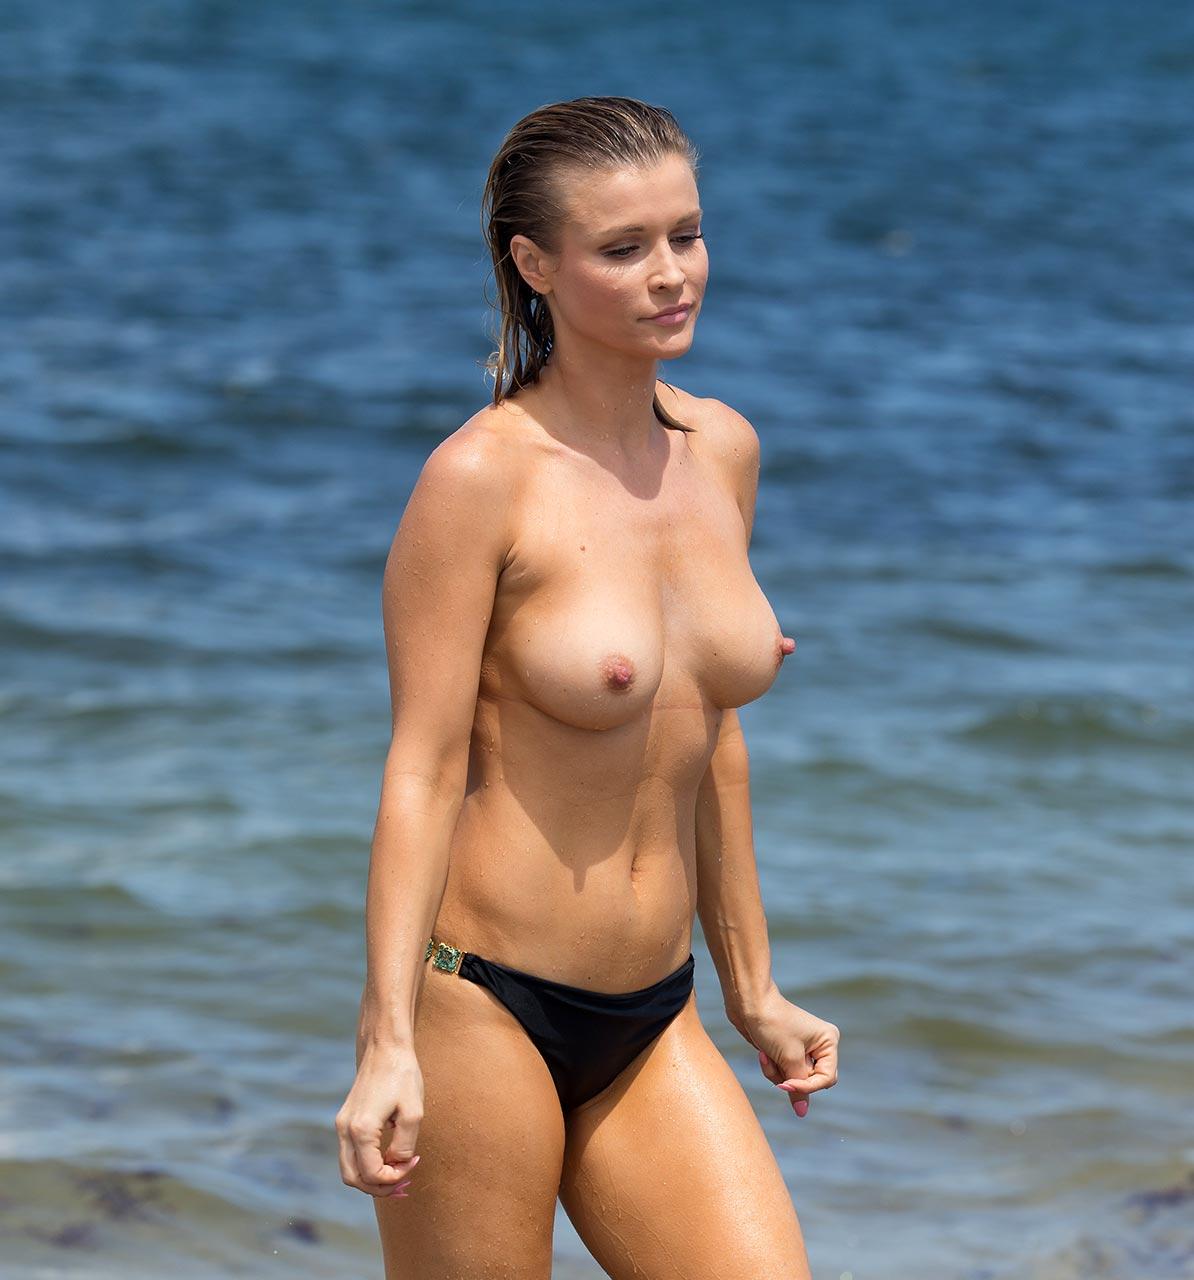 Sex Joanna Krupa nude photos 2019